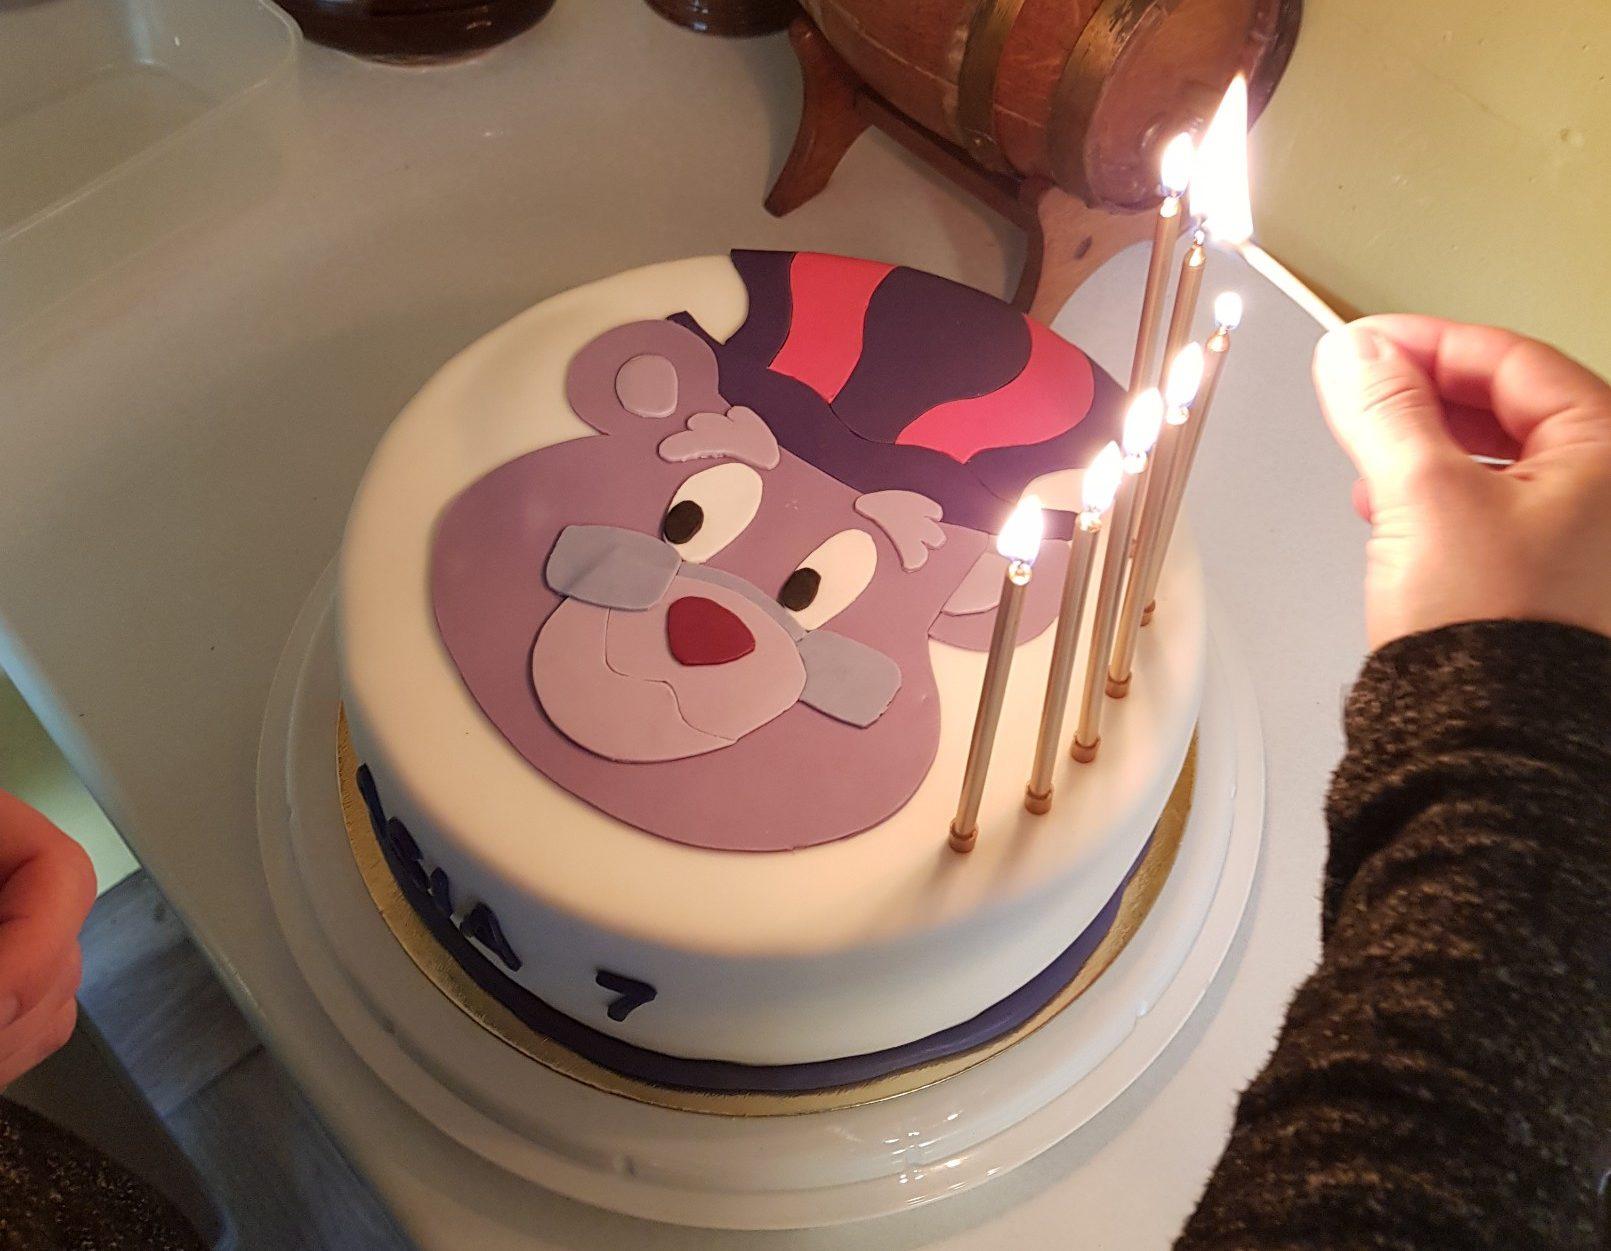 gummi bears birthday cake candles lit